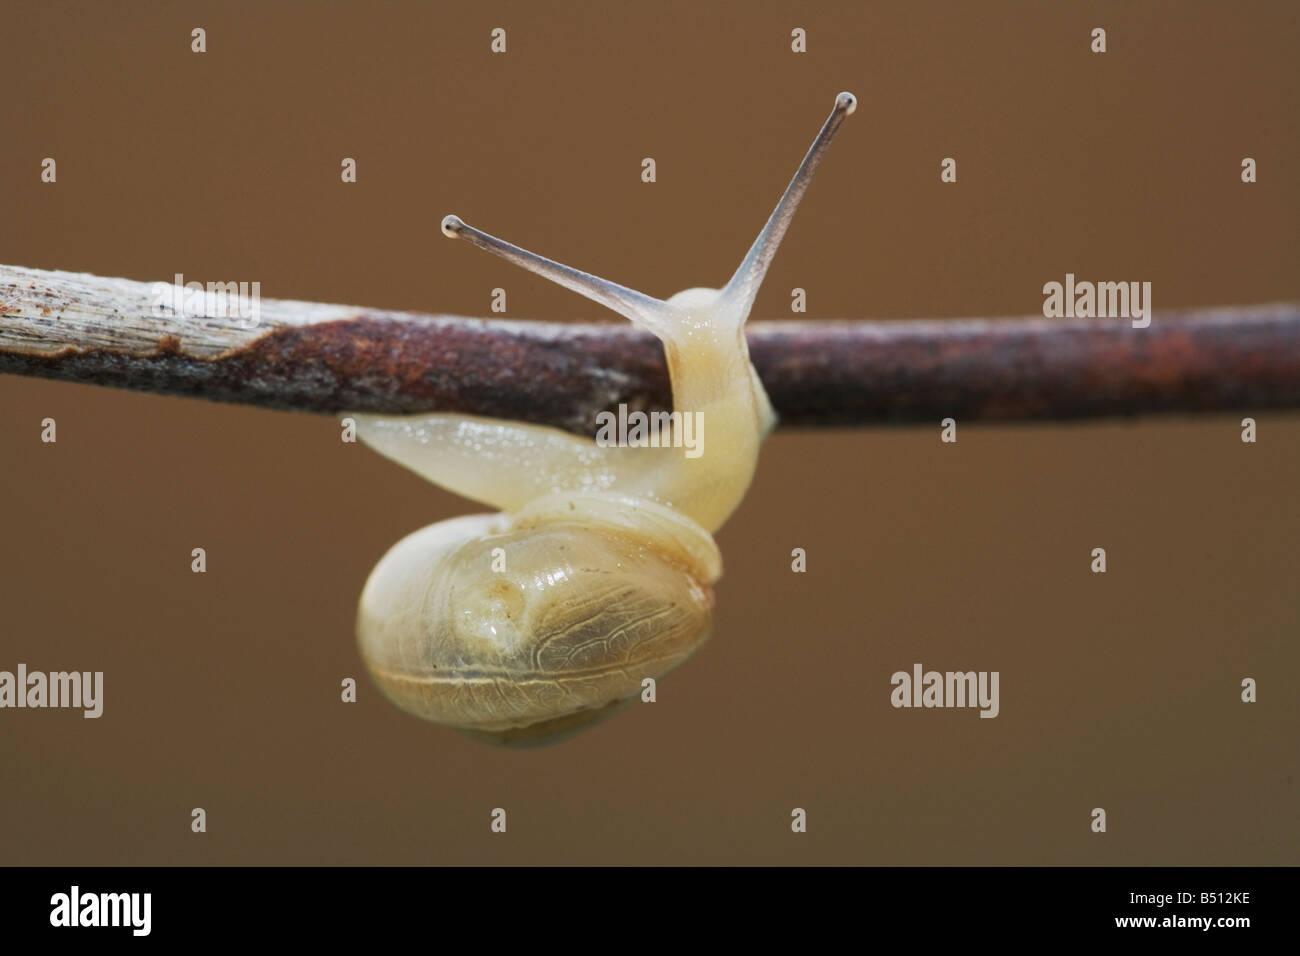 Land Snail Gastropoda adult Sinton Corpus Christi Coastal Bend Texas USA - Stock Image